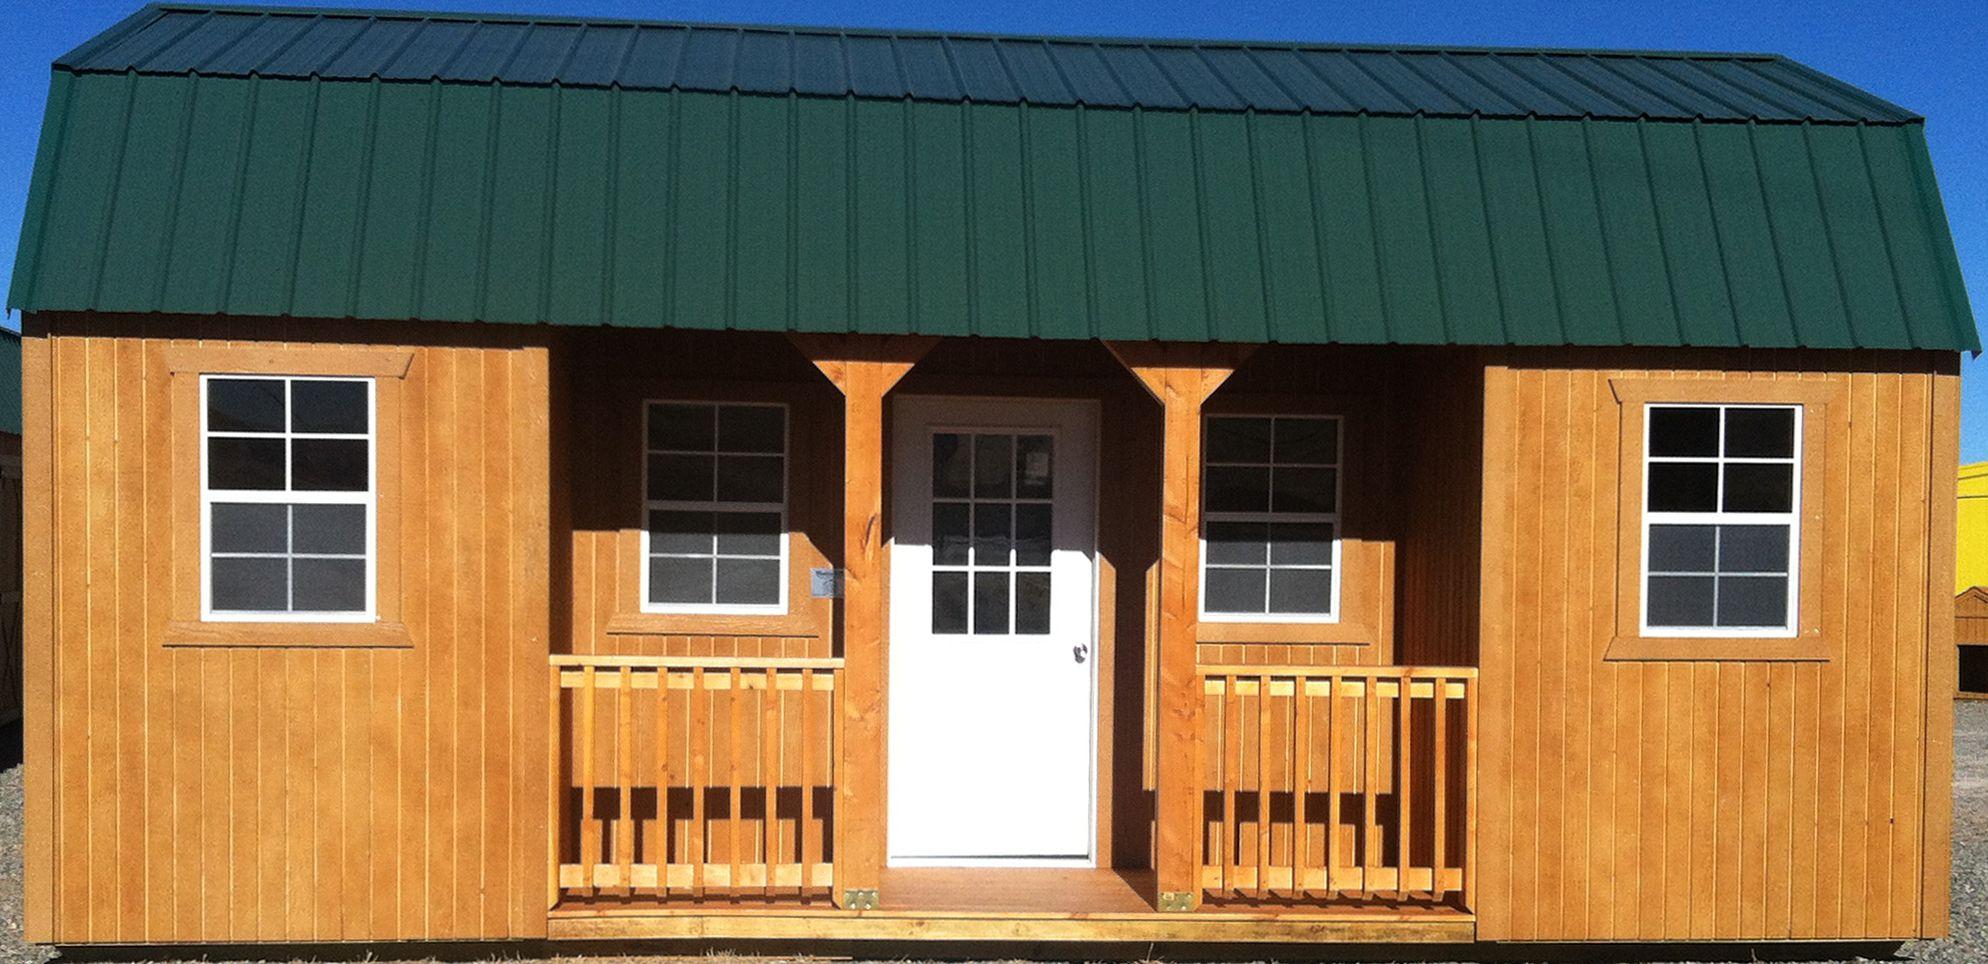 10 x 20 center porch 3x6 lofted over